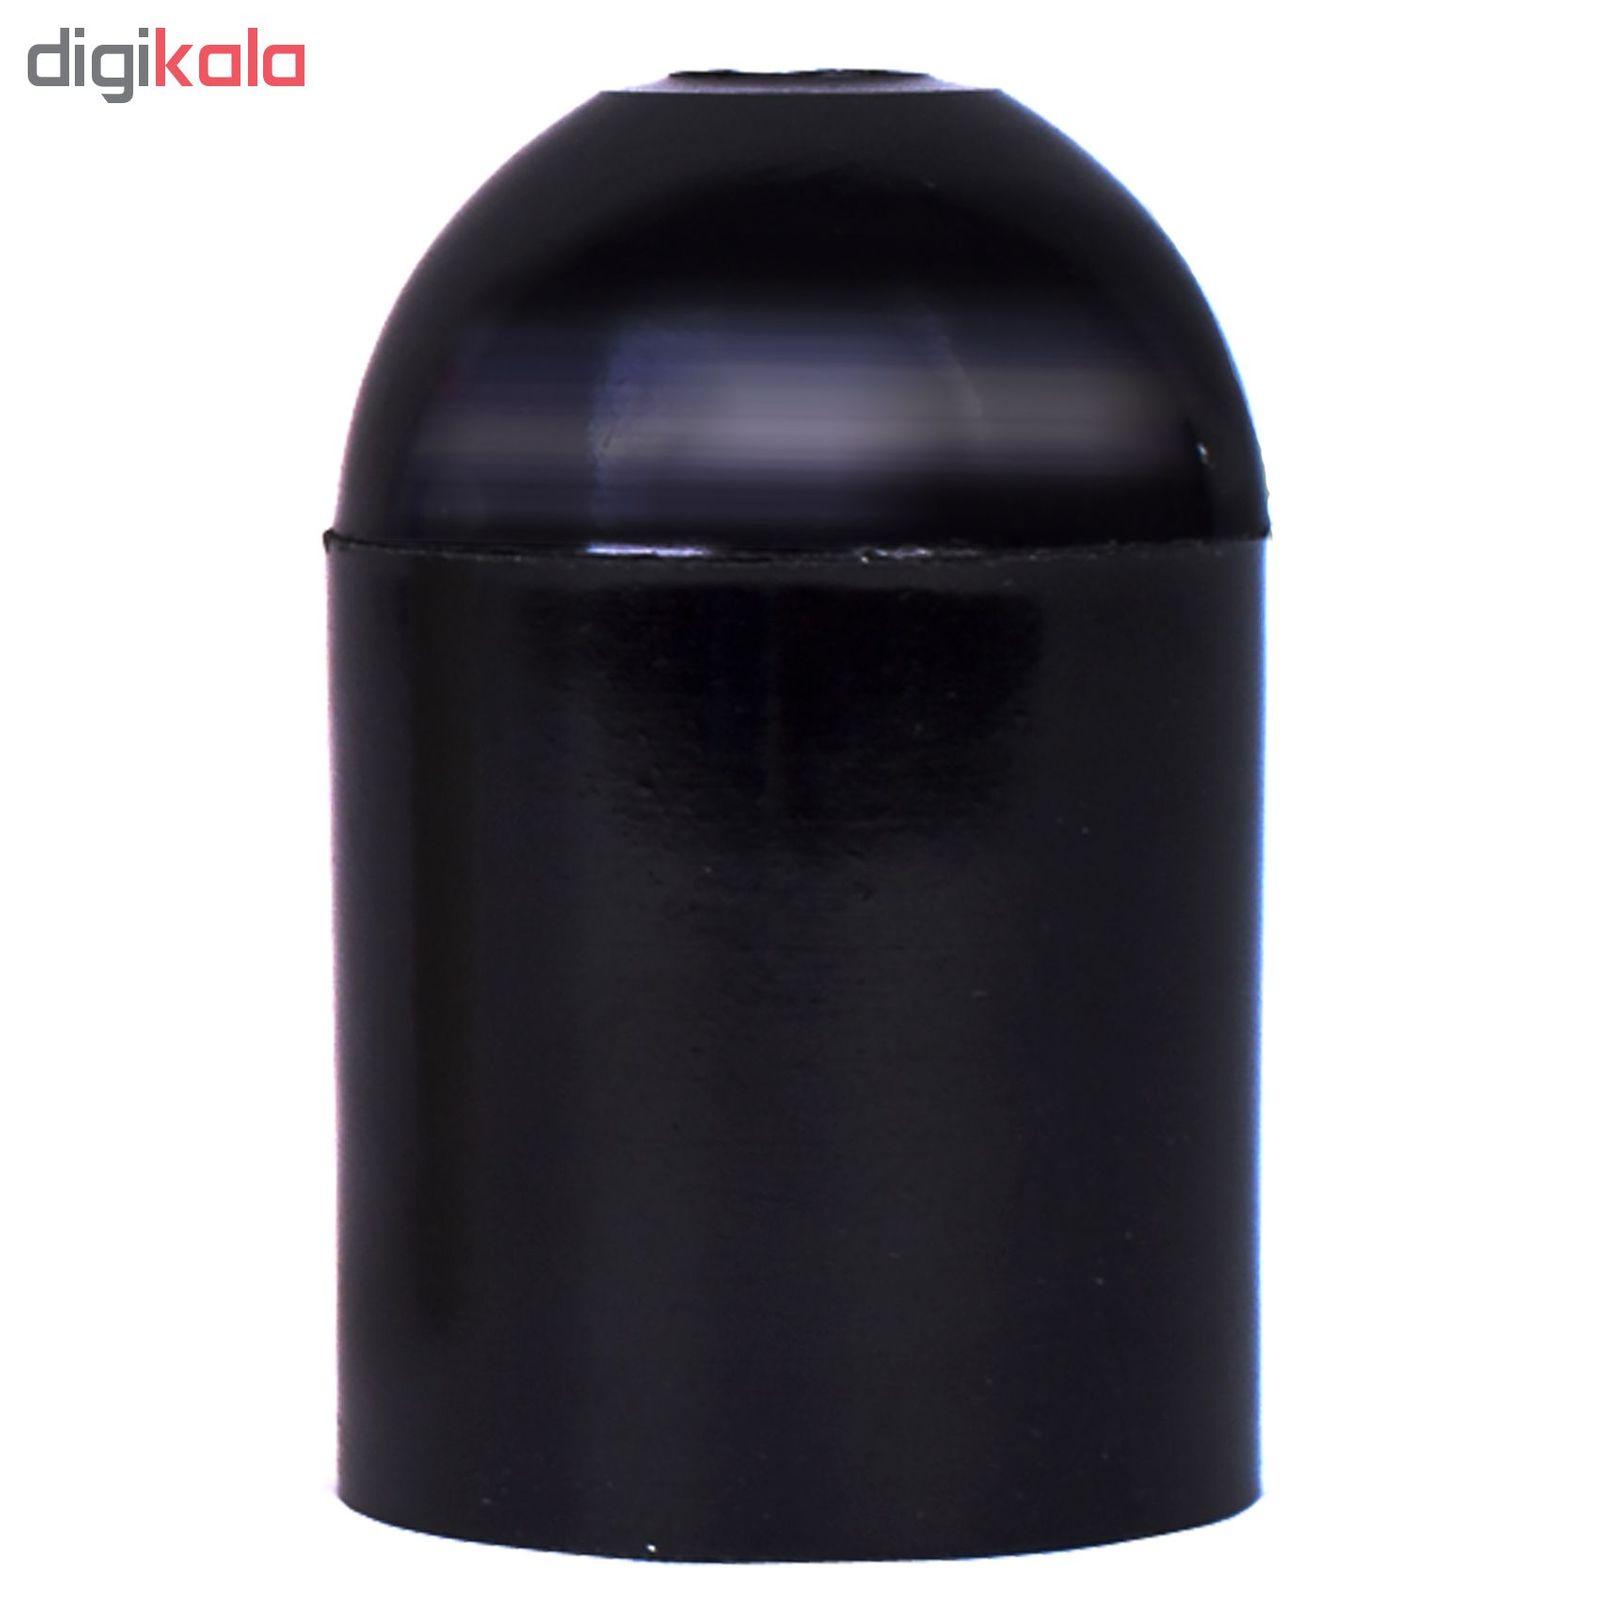 سرپیچ لامپ خیام الکتریک کد KH8042 پایه E27 بسته 2 عددی  main 1 3